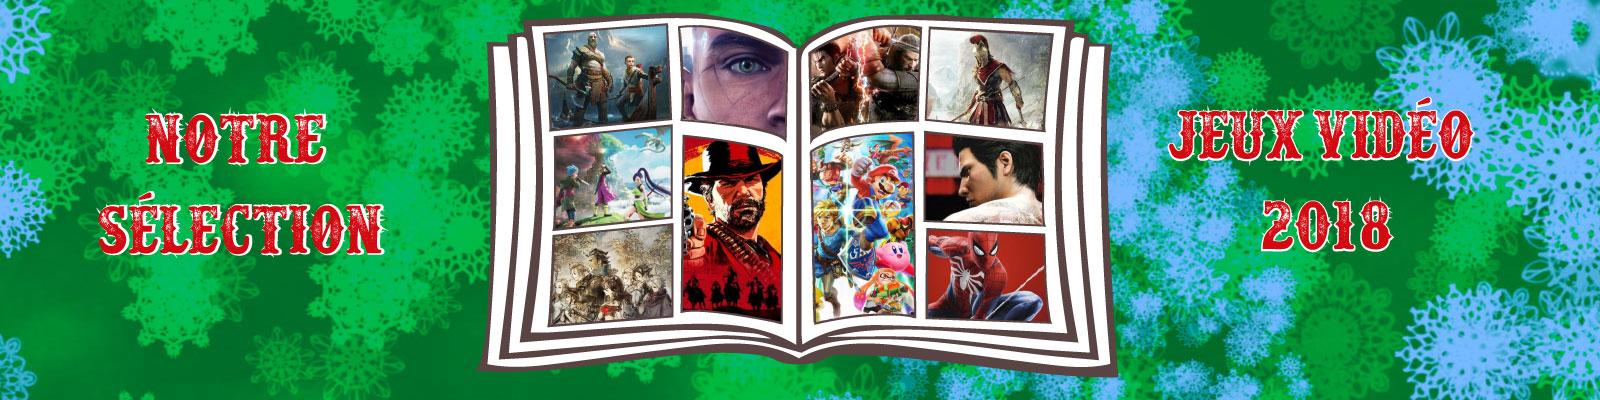 selection-jeux vidéo